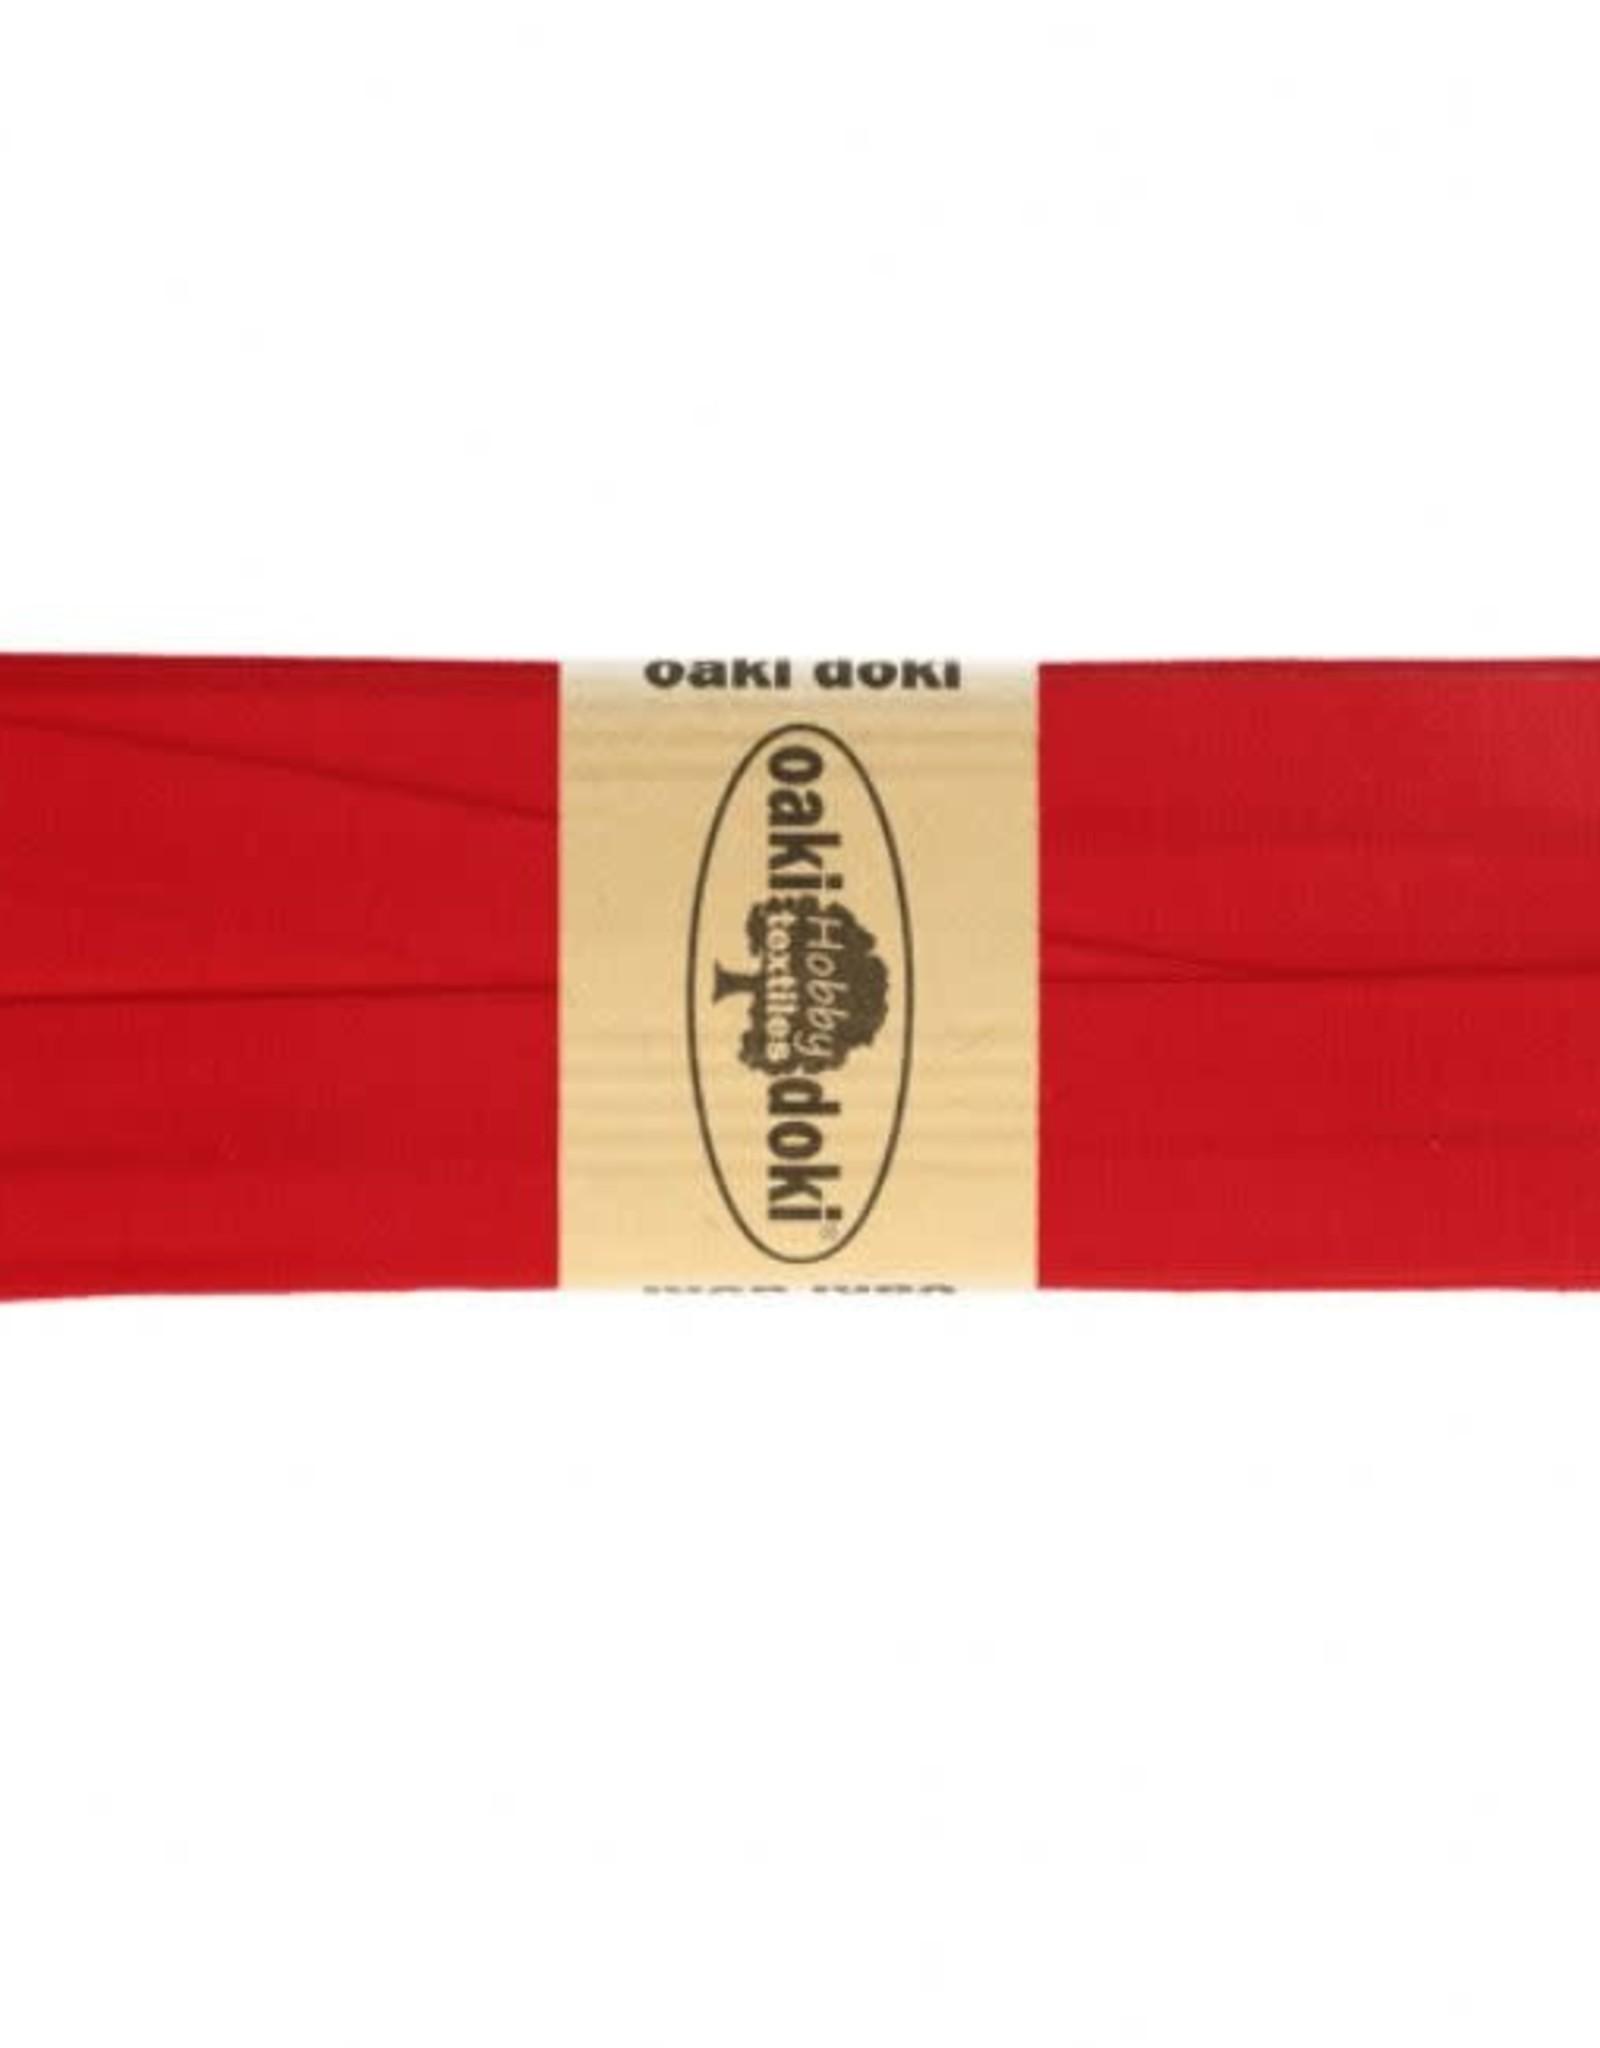 Oaki Doki Biais tricot de luxe Oaki Doki rood 620